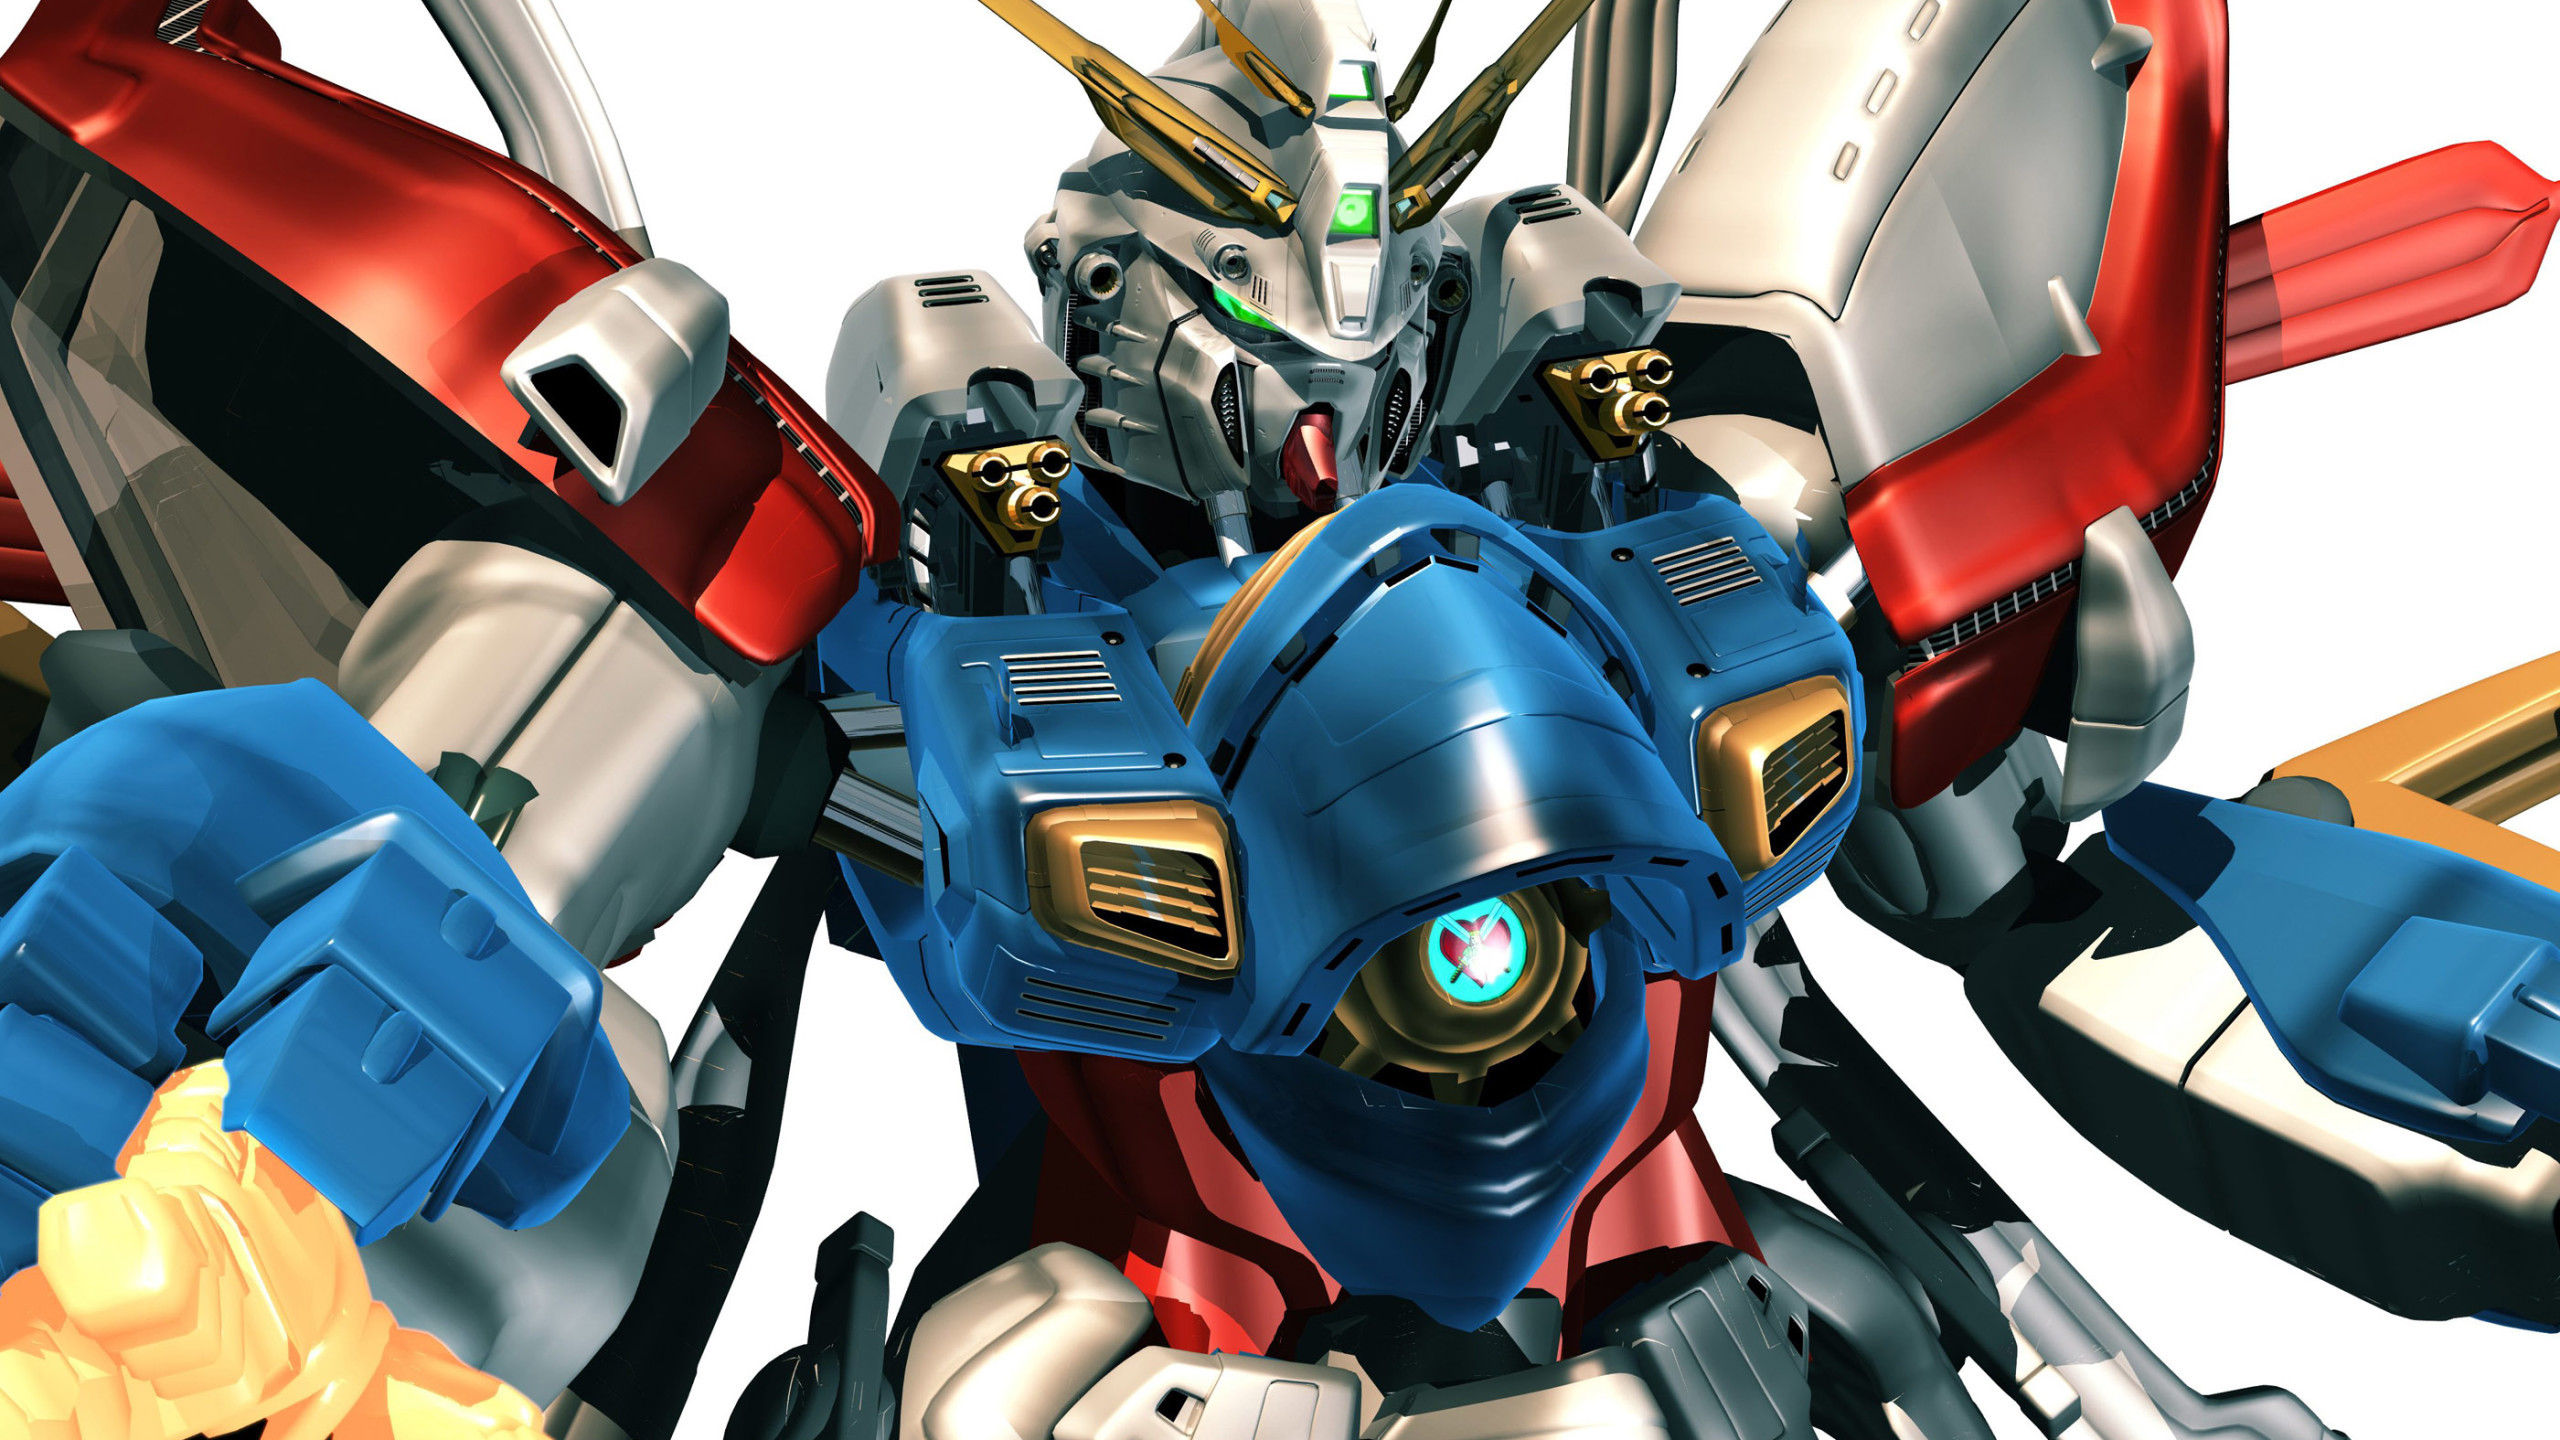 Free Download Digimon Wallpapers   PixelsTalk.Net · Gundam ArtGundam  WingGundam …